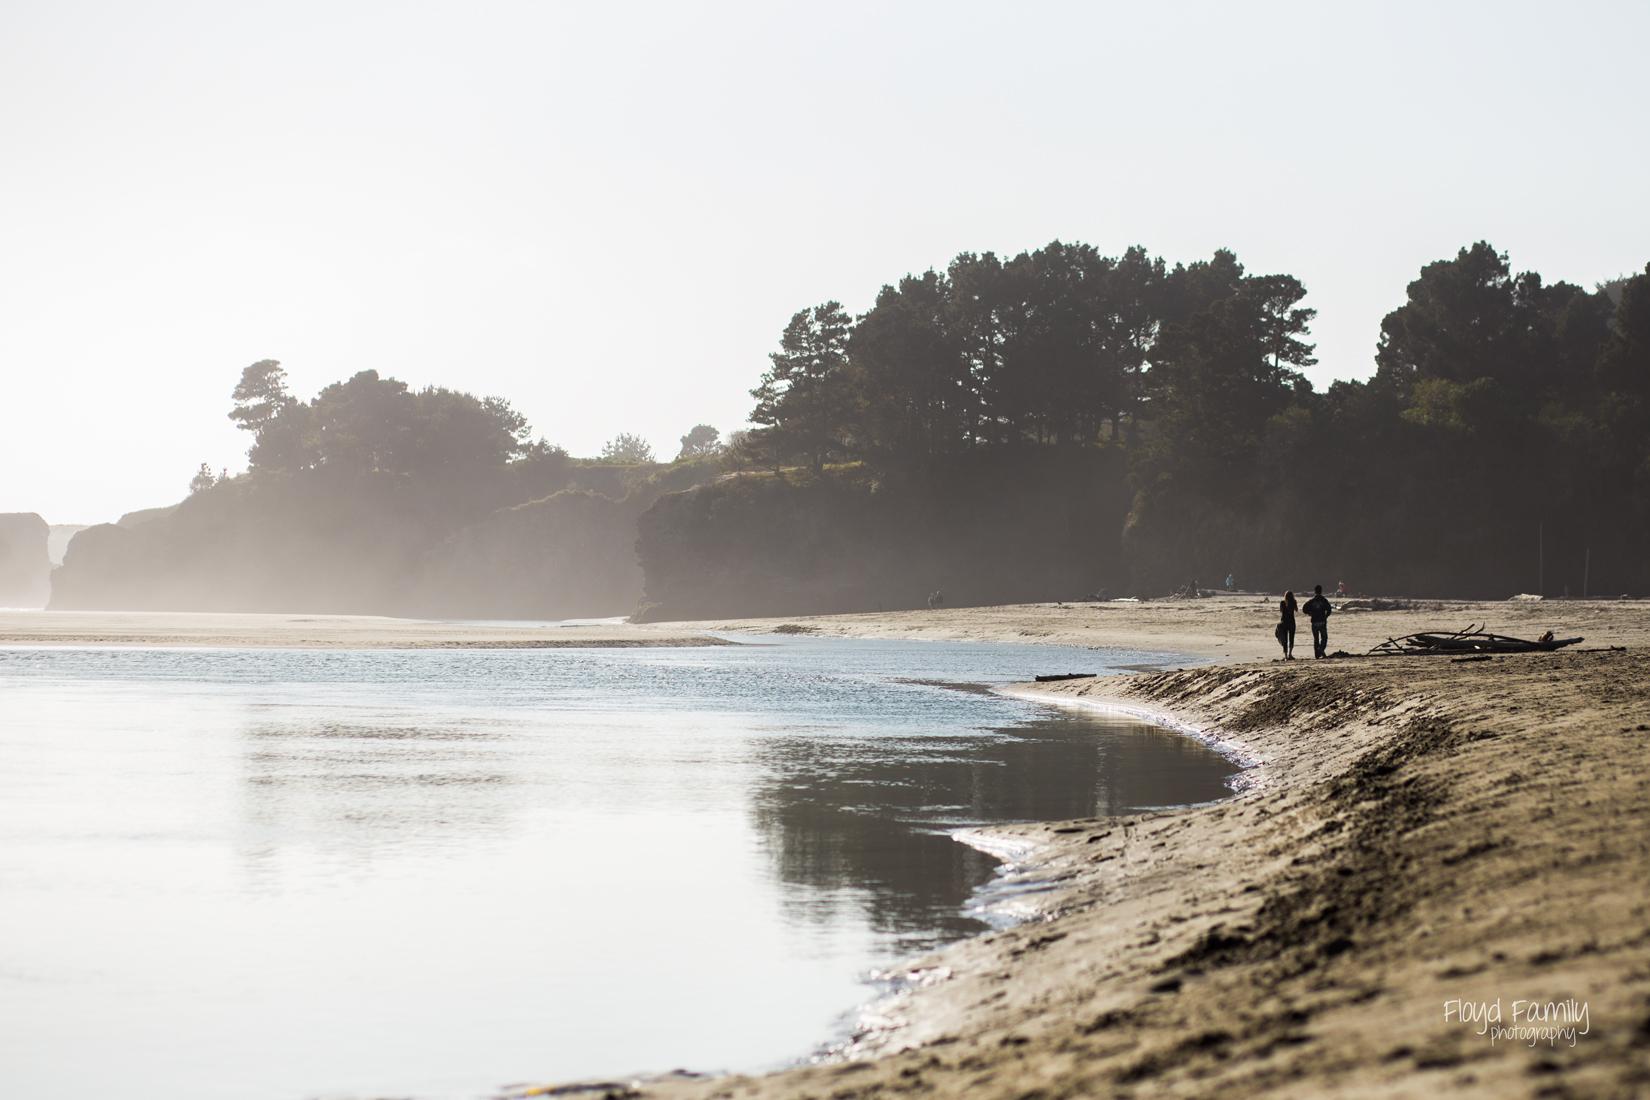 People on beach-summer-activities-Placerville-Children-Photographer